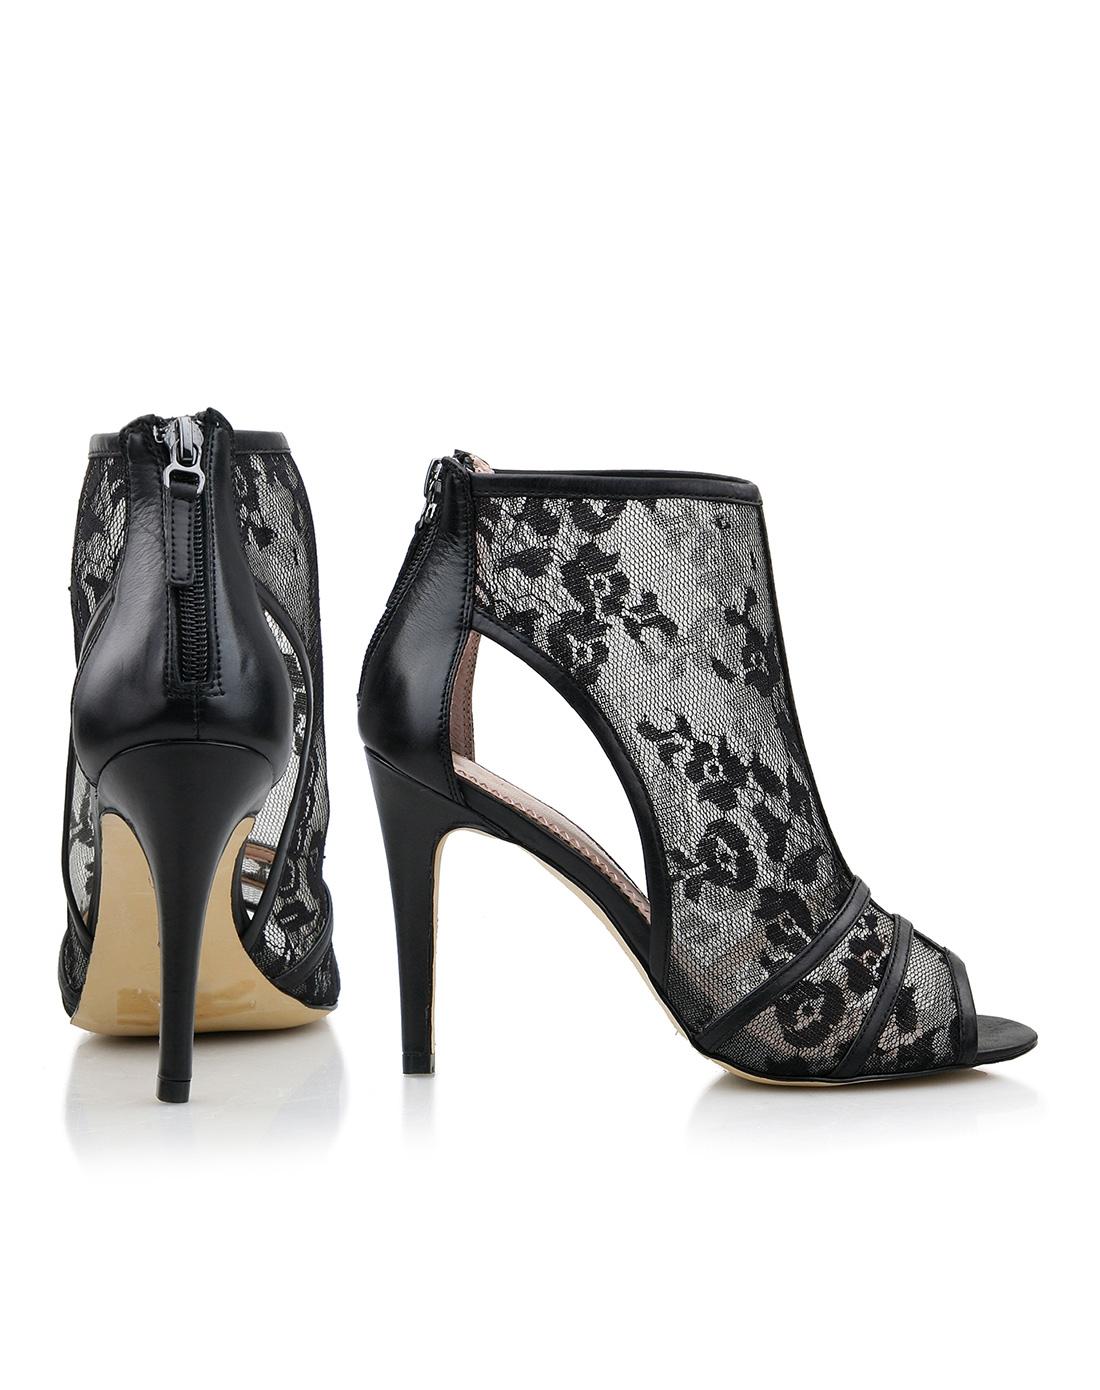 jcc 黑色网布花纹凉鞋